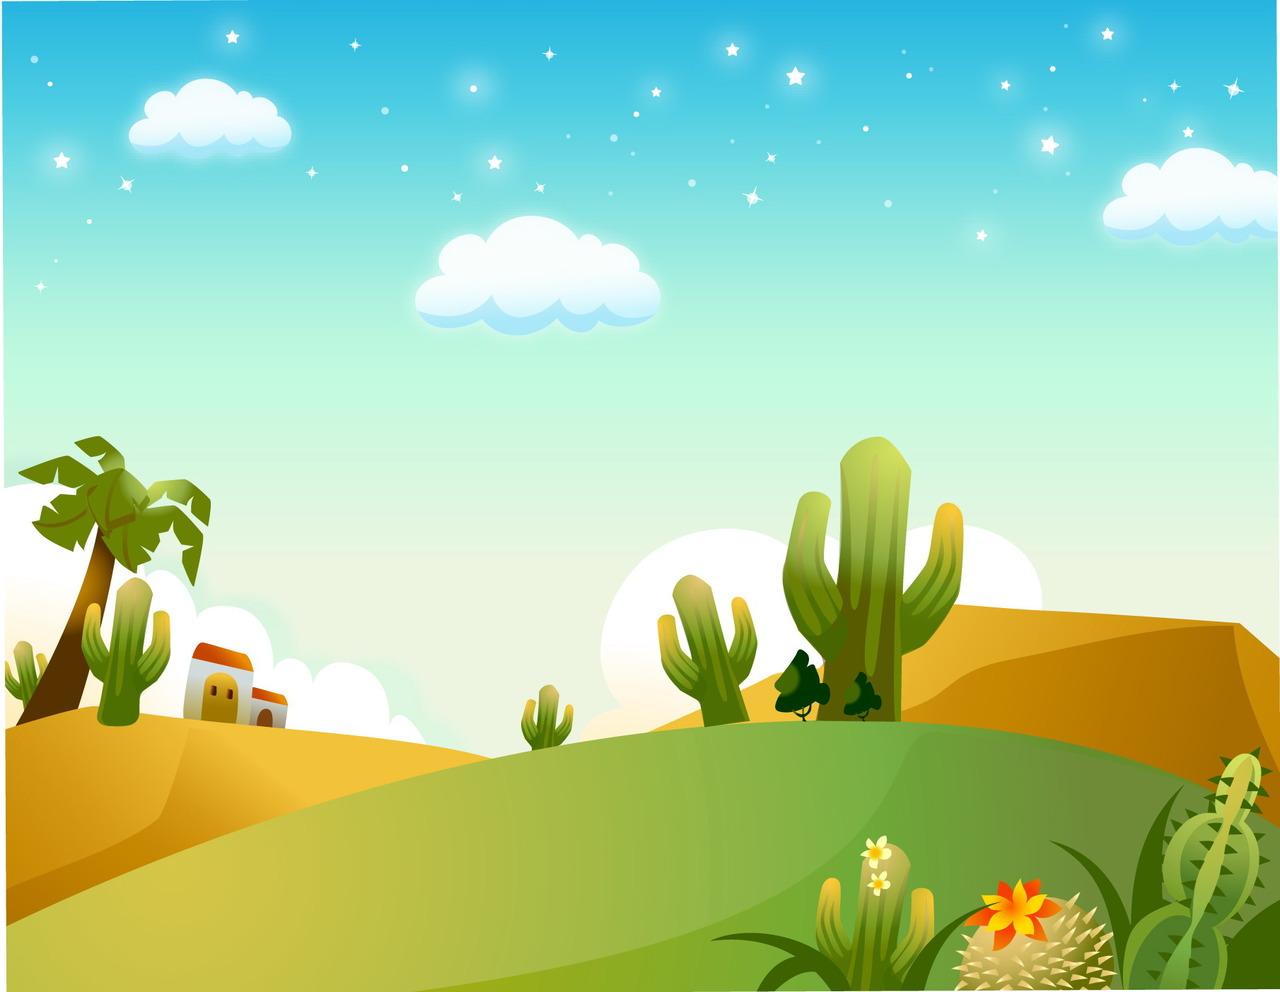 HD Wallpapers Fine: amazing cartoon hd wallpaper free download 1080p 2013